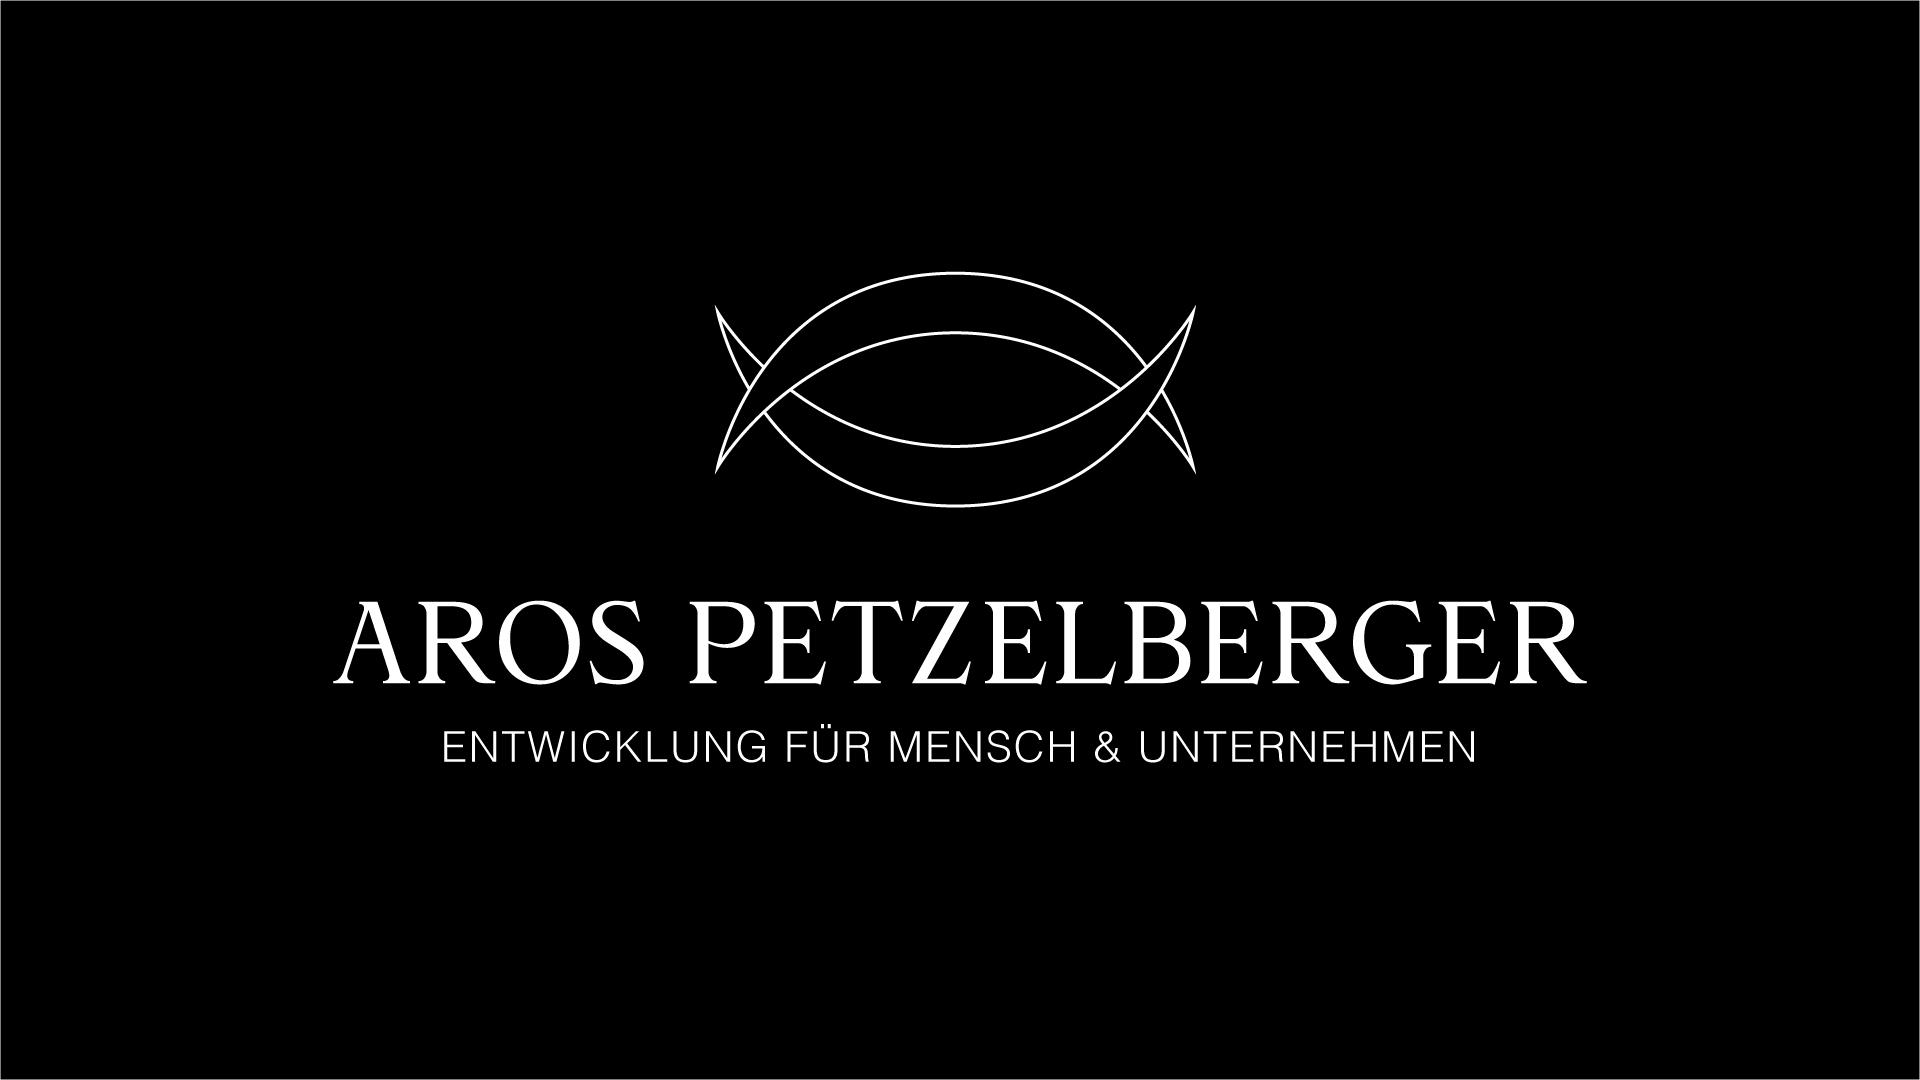 Aros Petzelberger